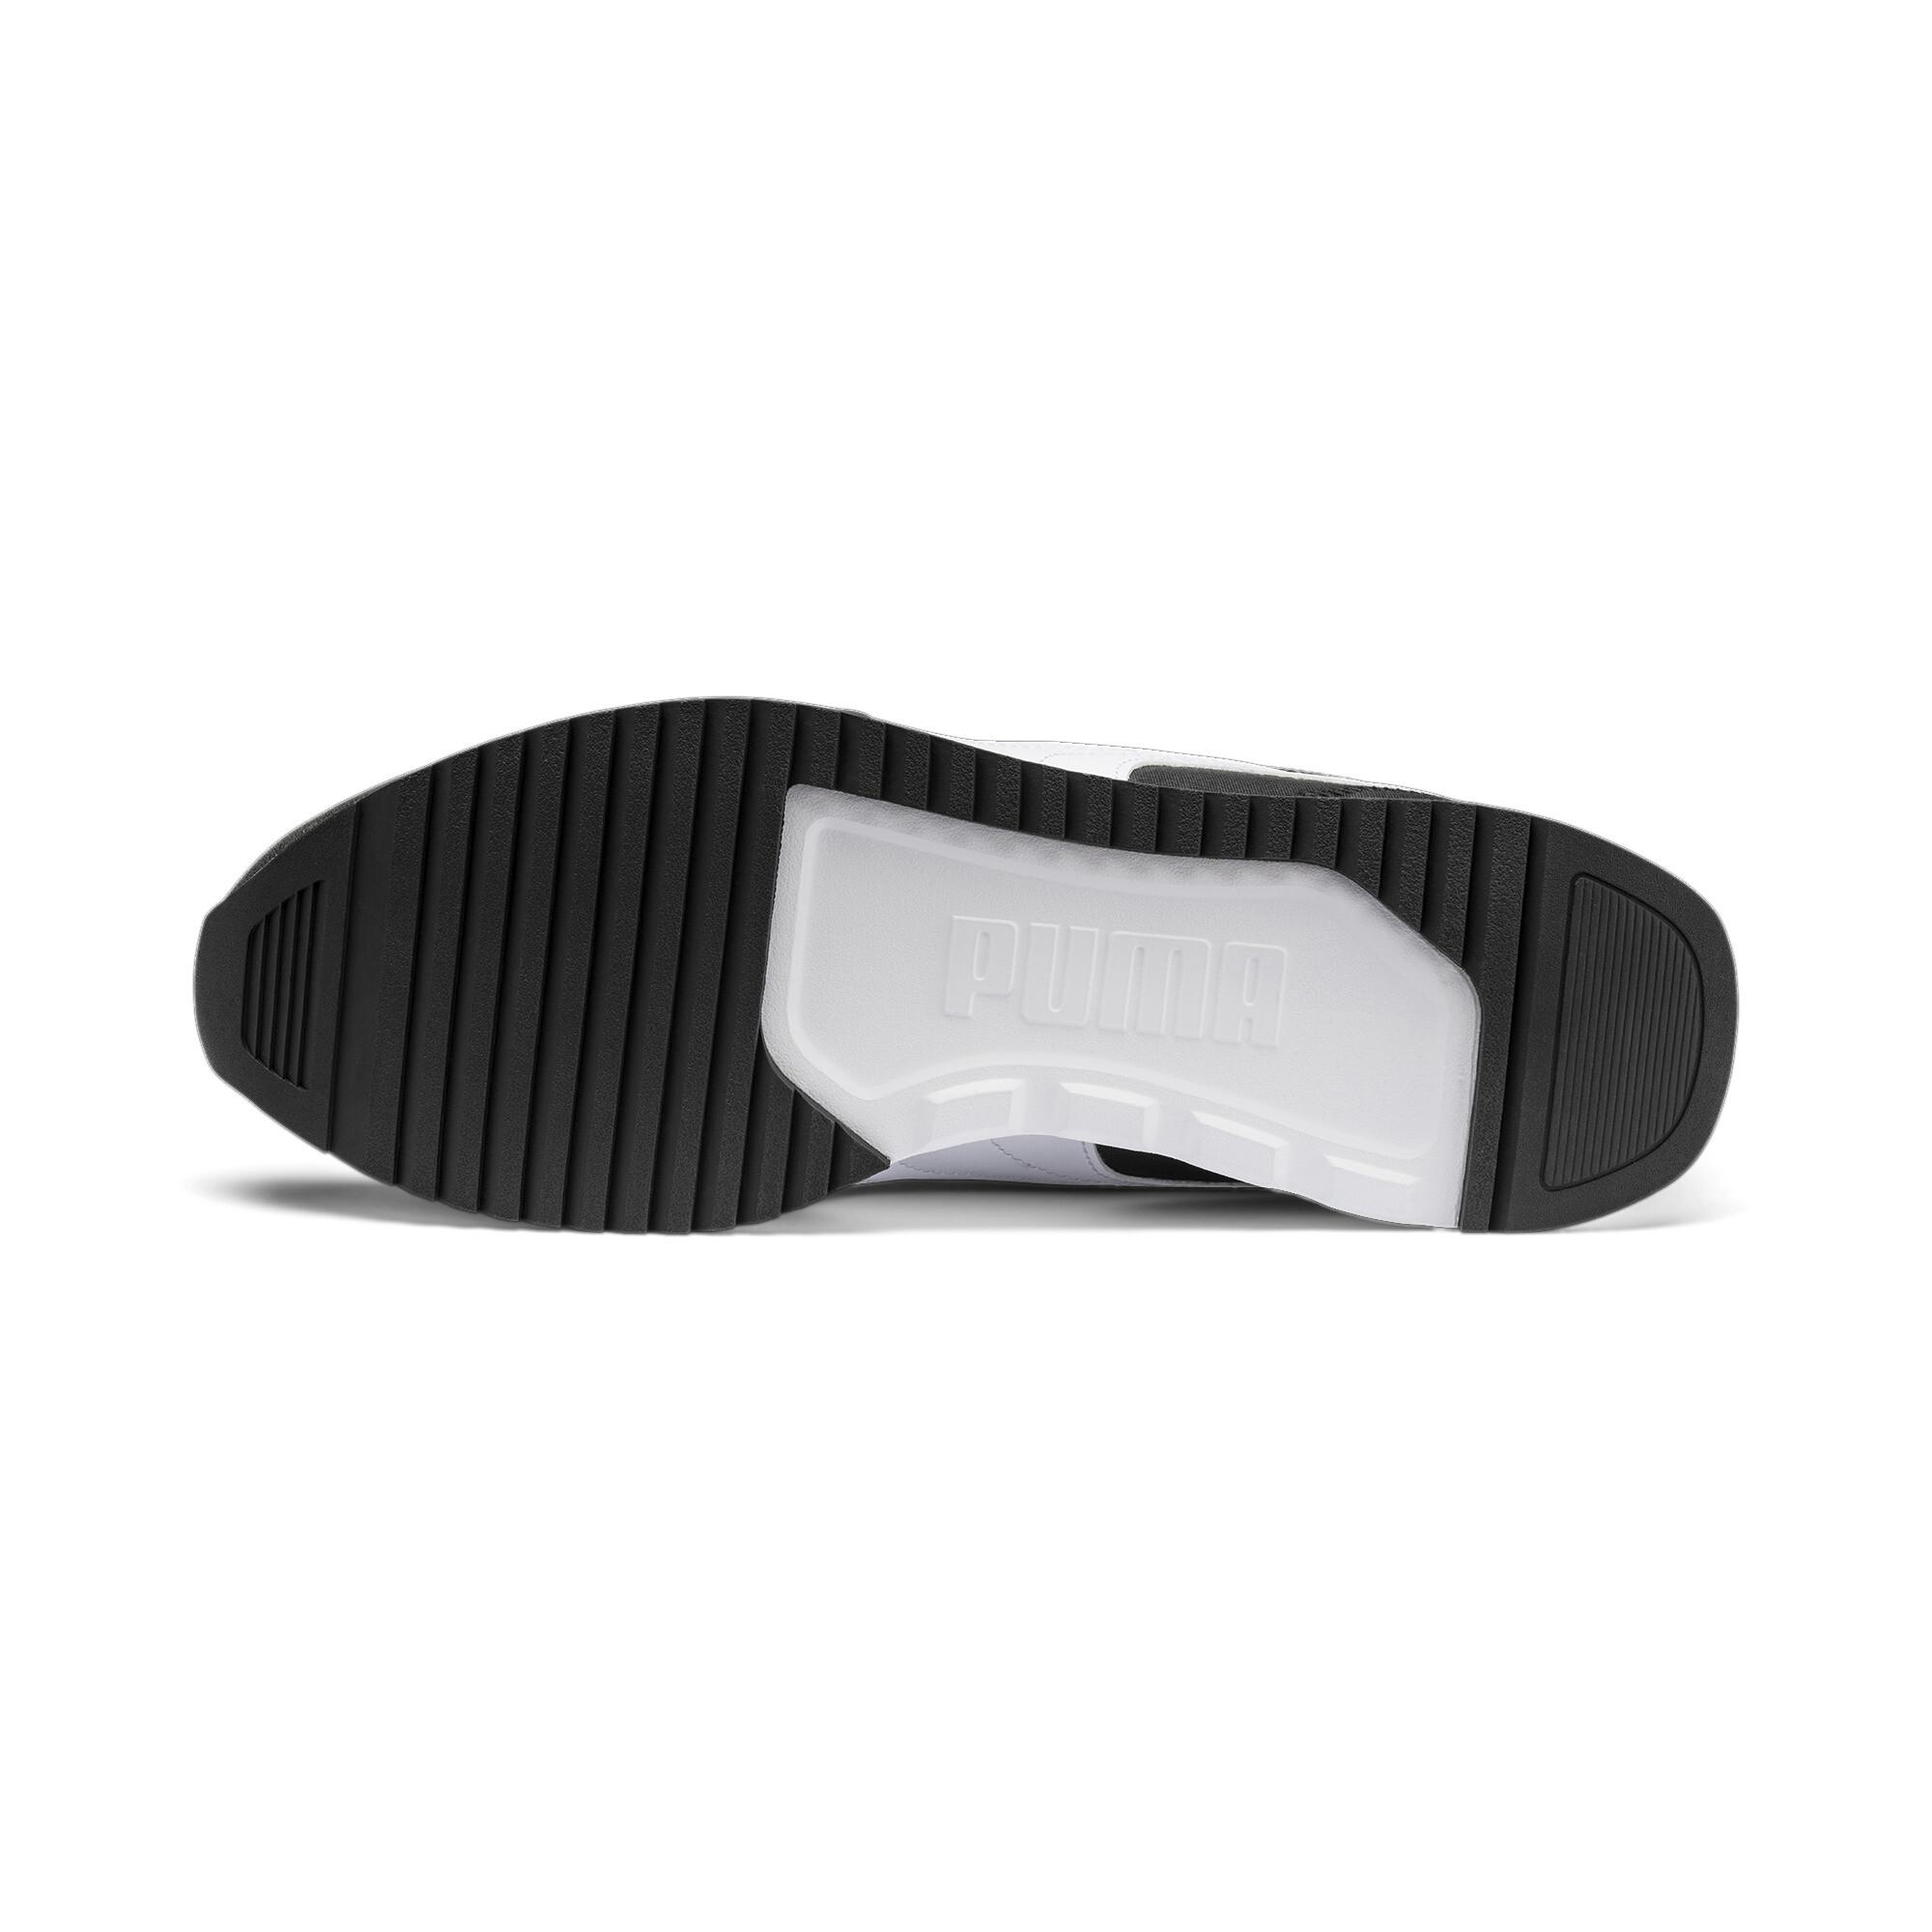 thumbnail 15 - PUMA-Men-039-s-R78-Sneakers